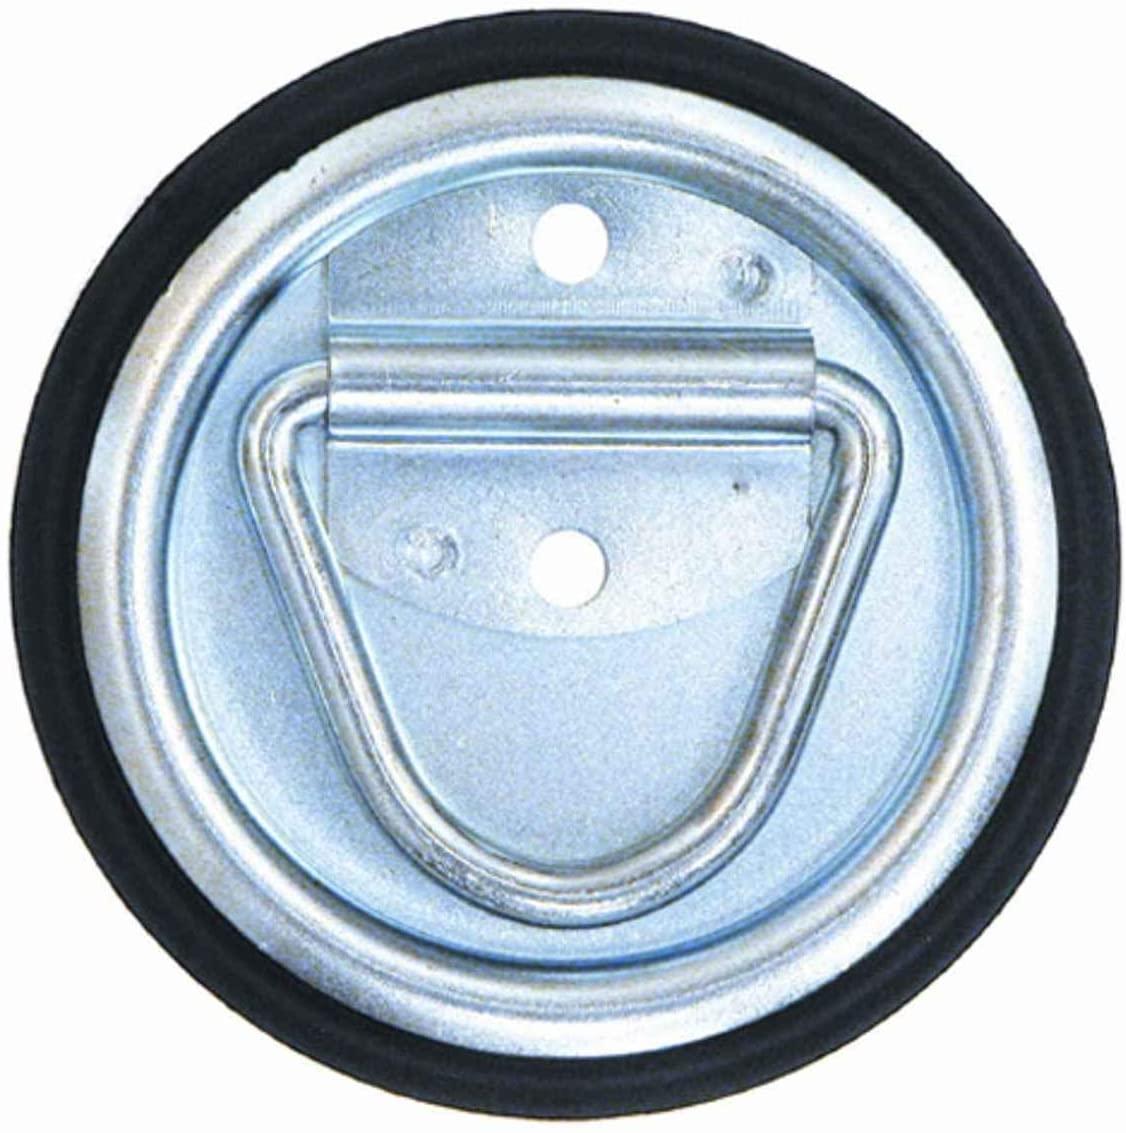 Buyers Chrome Solid Steel Grab Handles - 13 1/4in. L